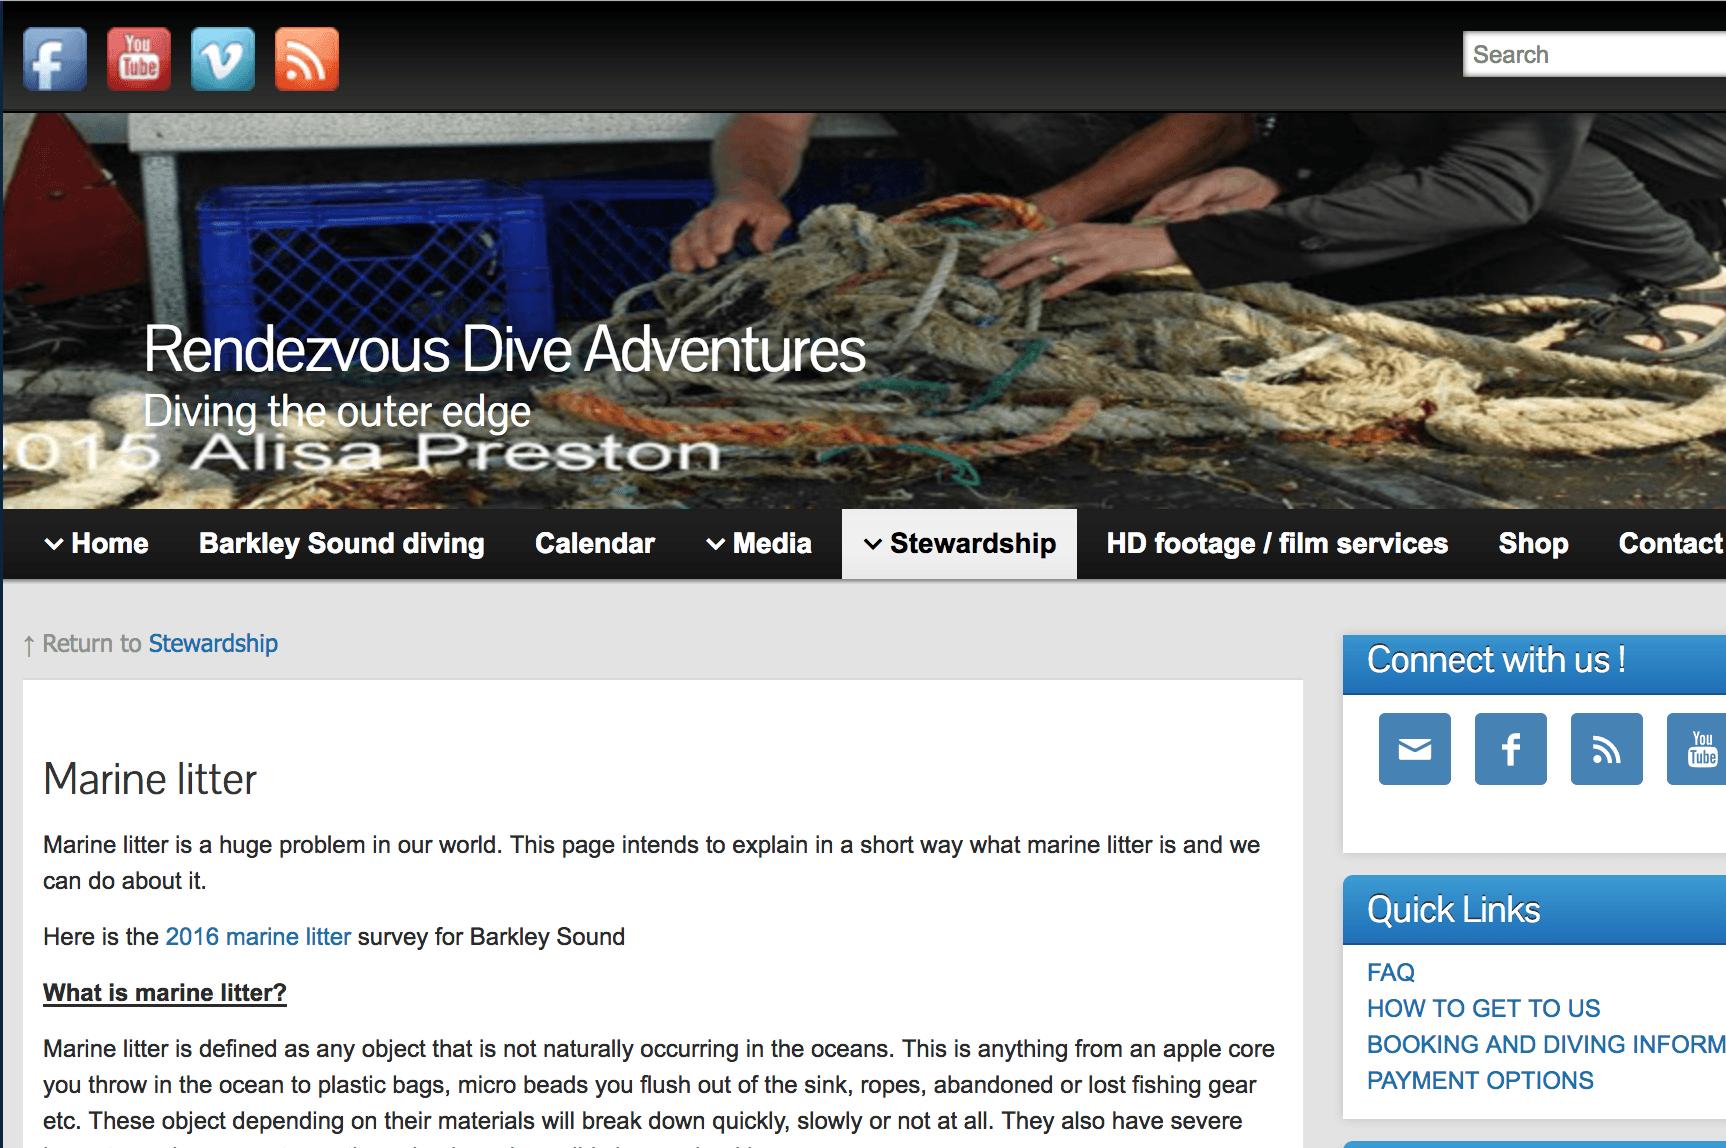 Rendezvous Dive Adventures